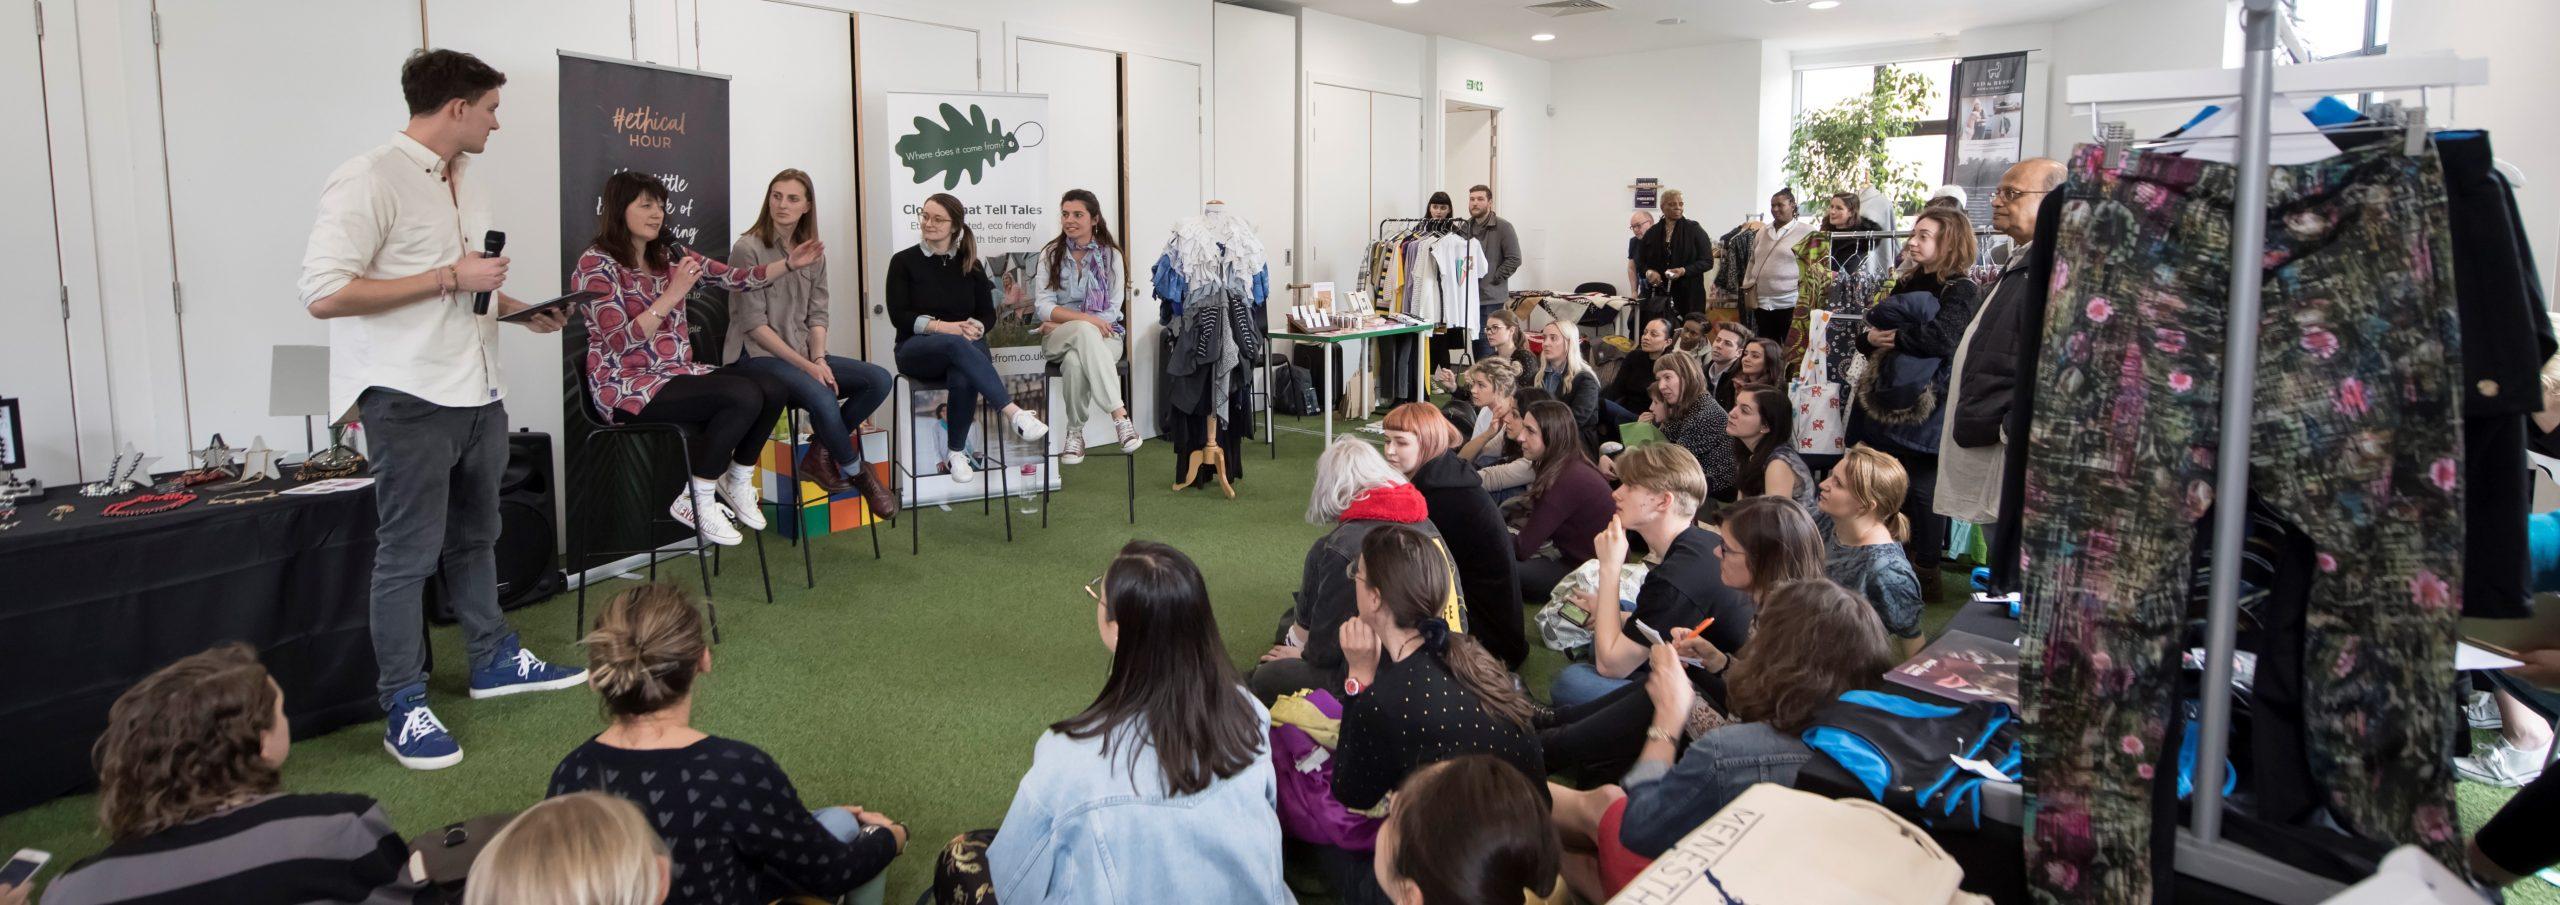 ethical brand for fashion revolution 2020